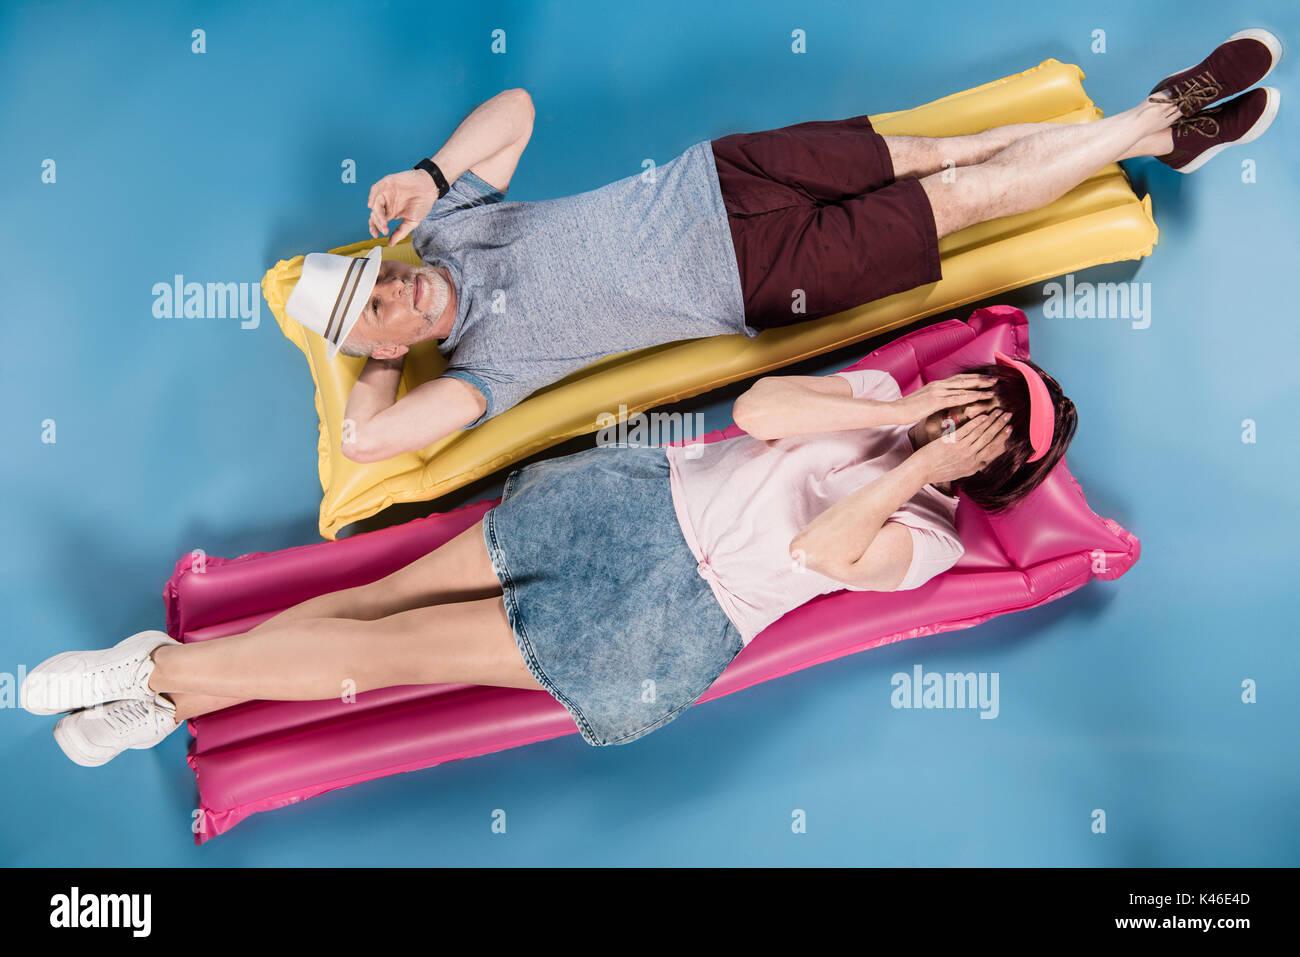 stylish elderly couple lying on colorful swimming mattresses - Stock Image